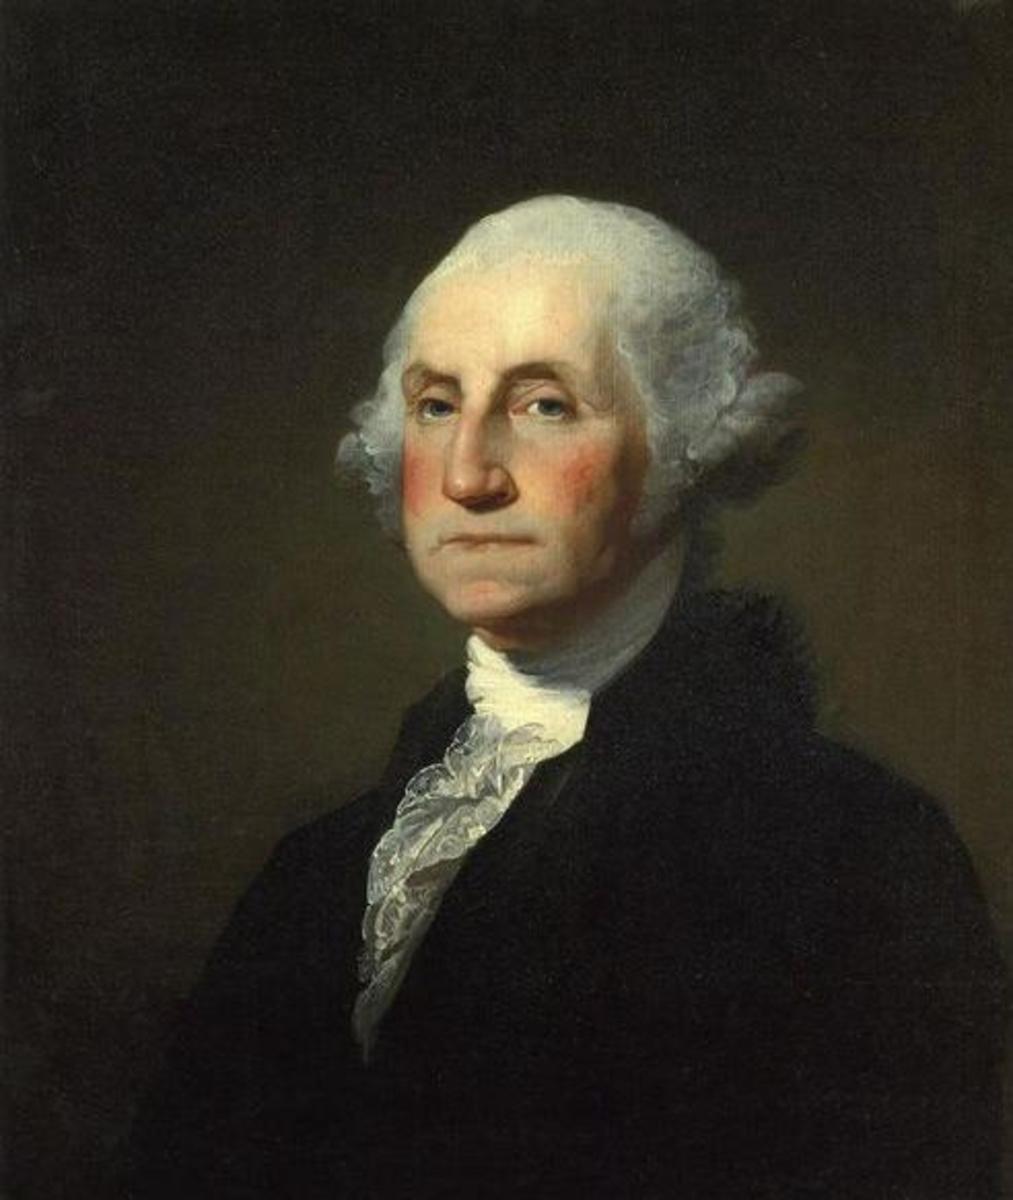 George Washington Portrait by Gilbert Stewart (http://en.wikipedia.org/wiki/File:Gilbert_Stuart_Williamstown_Portrait_of_George_Washington.jpg )